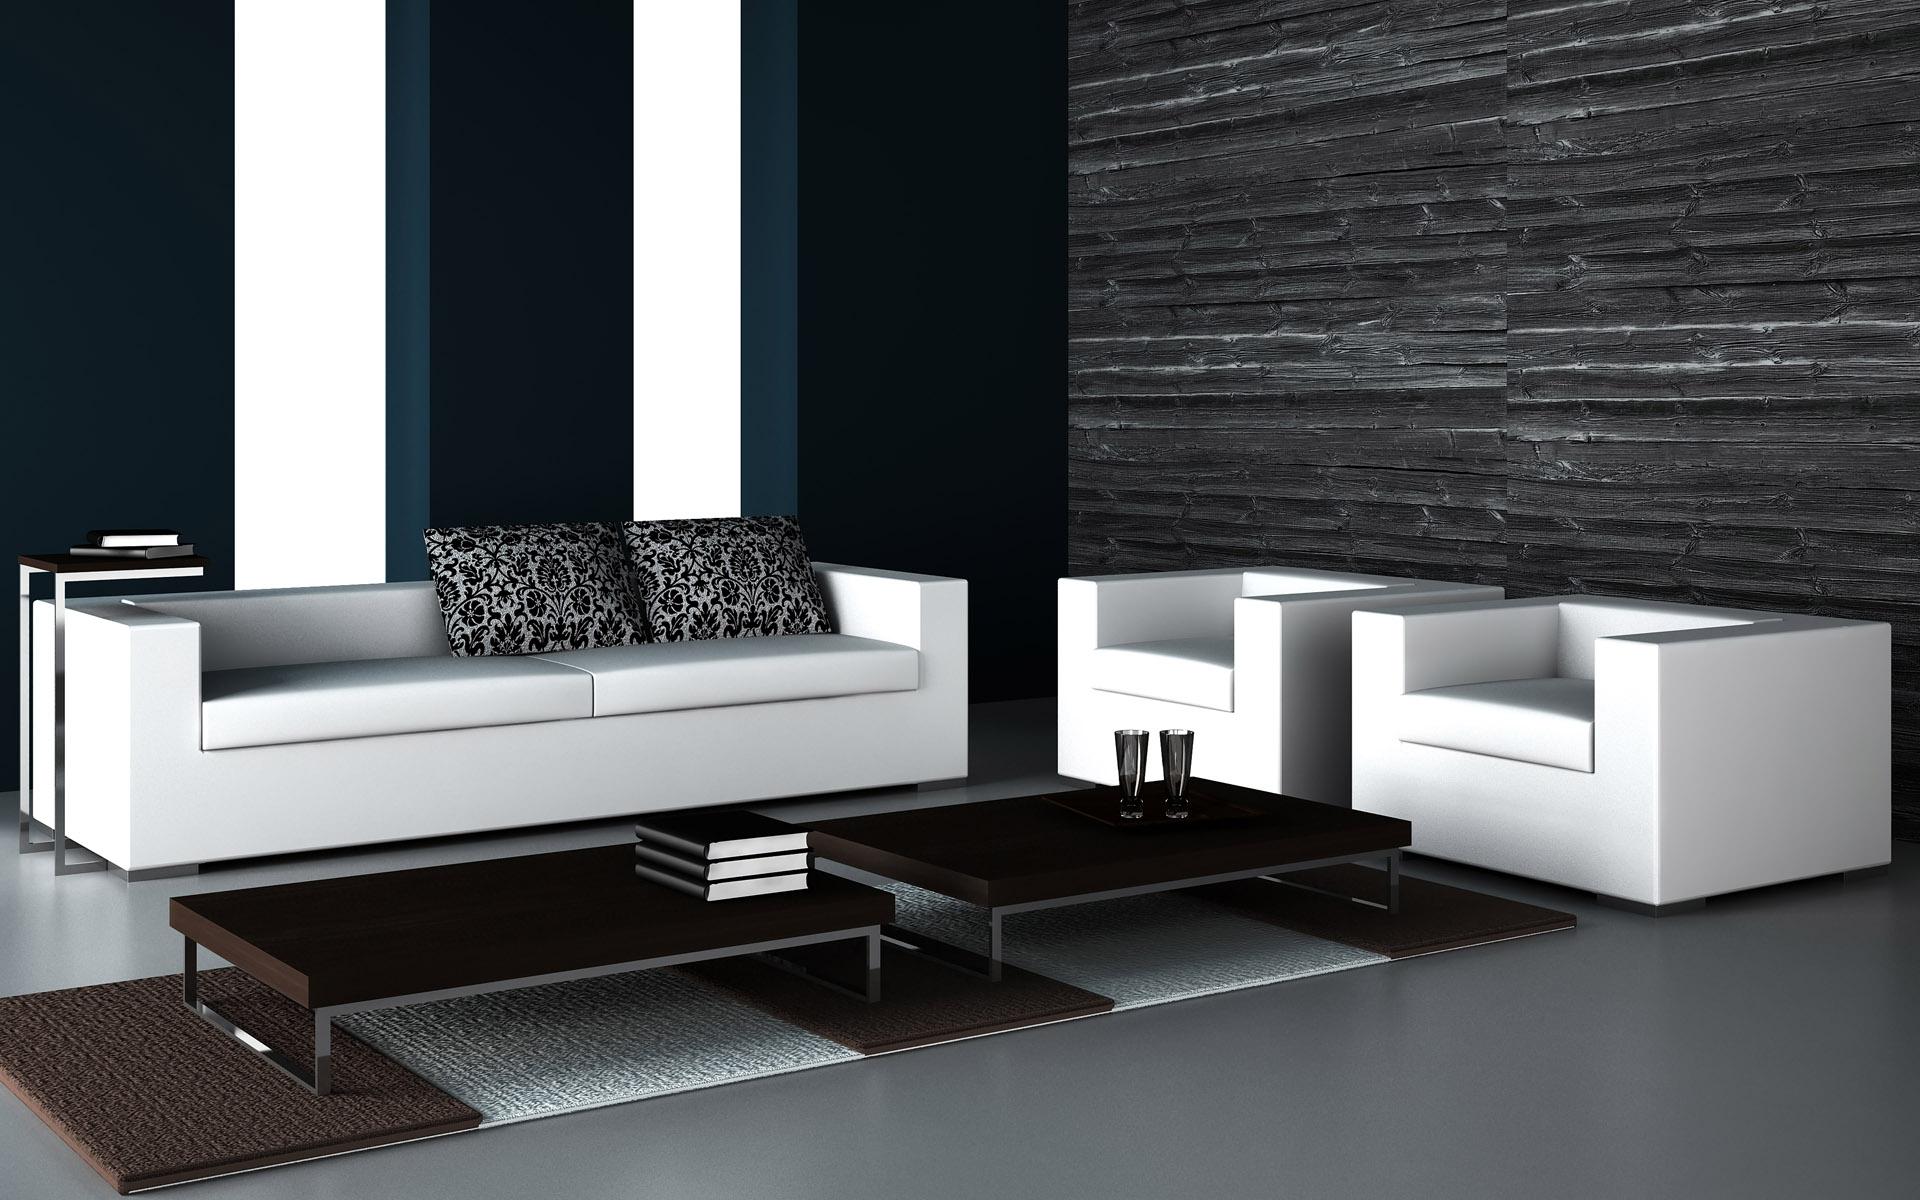 modern-drwaing-room-furniture-idea modern drwaing room furniture idea